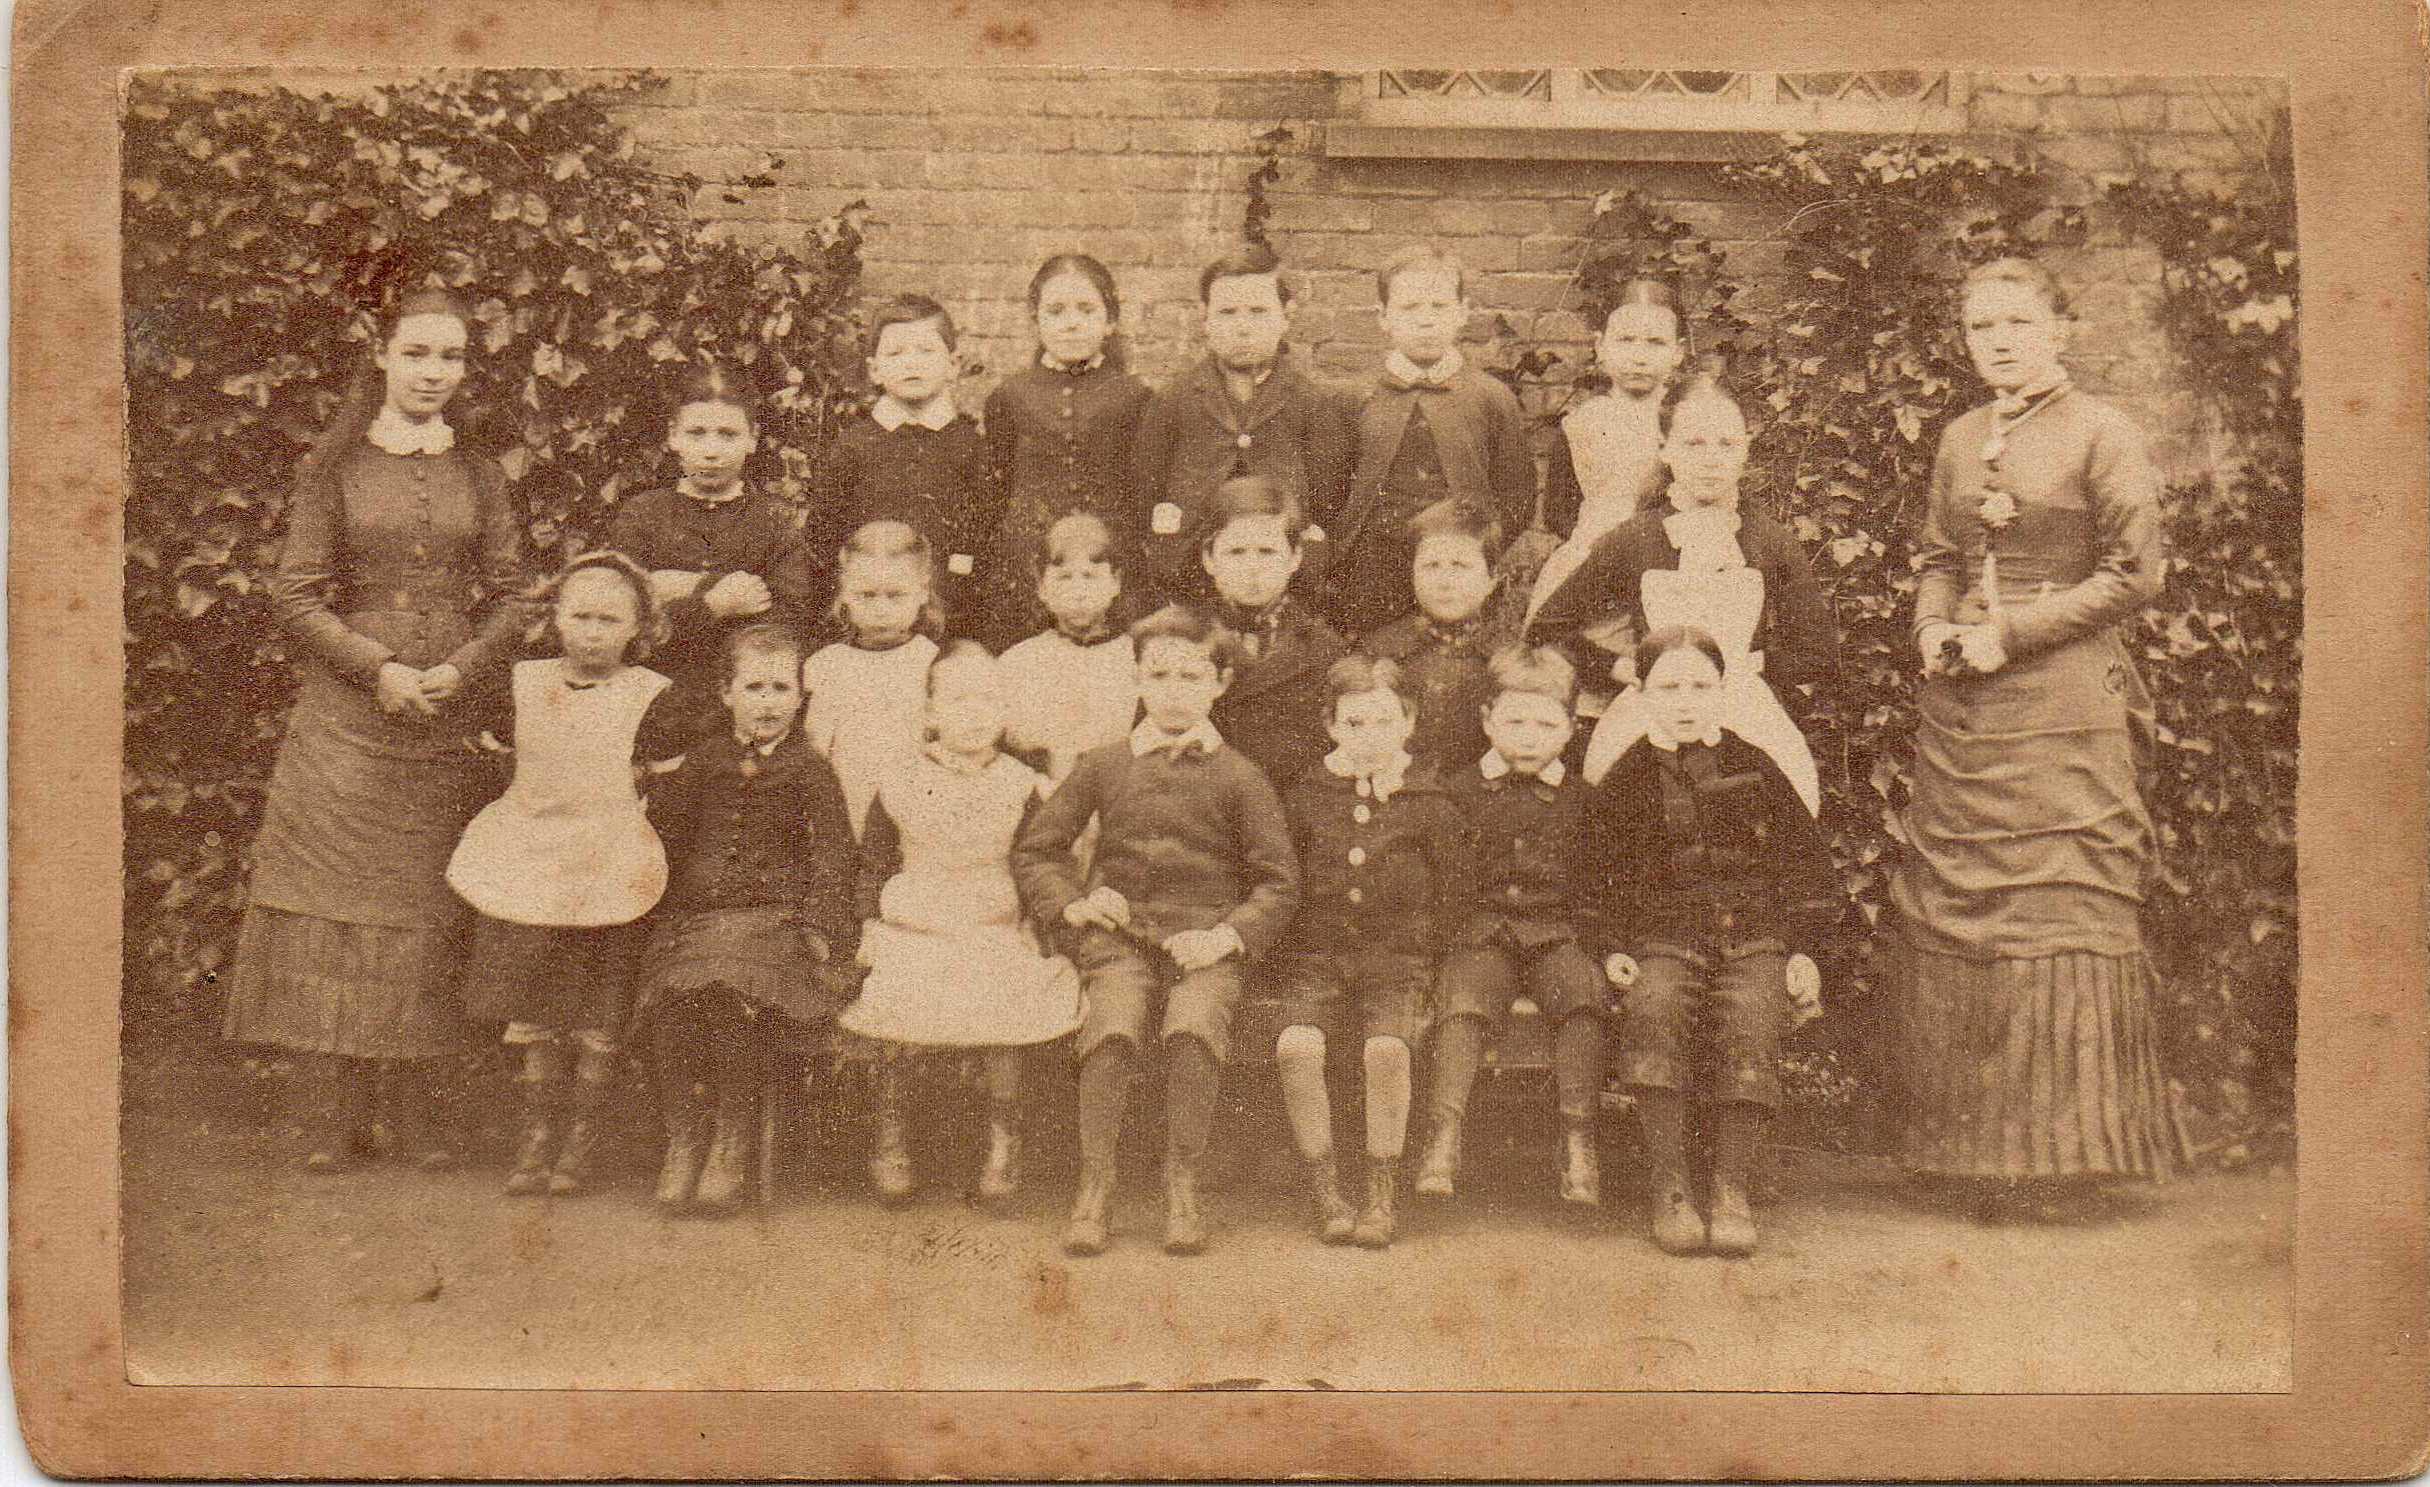 The Bedfordshire schoolchild